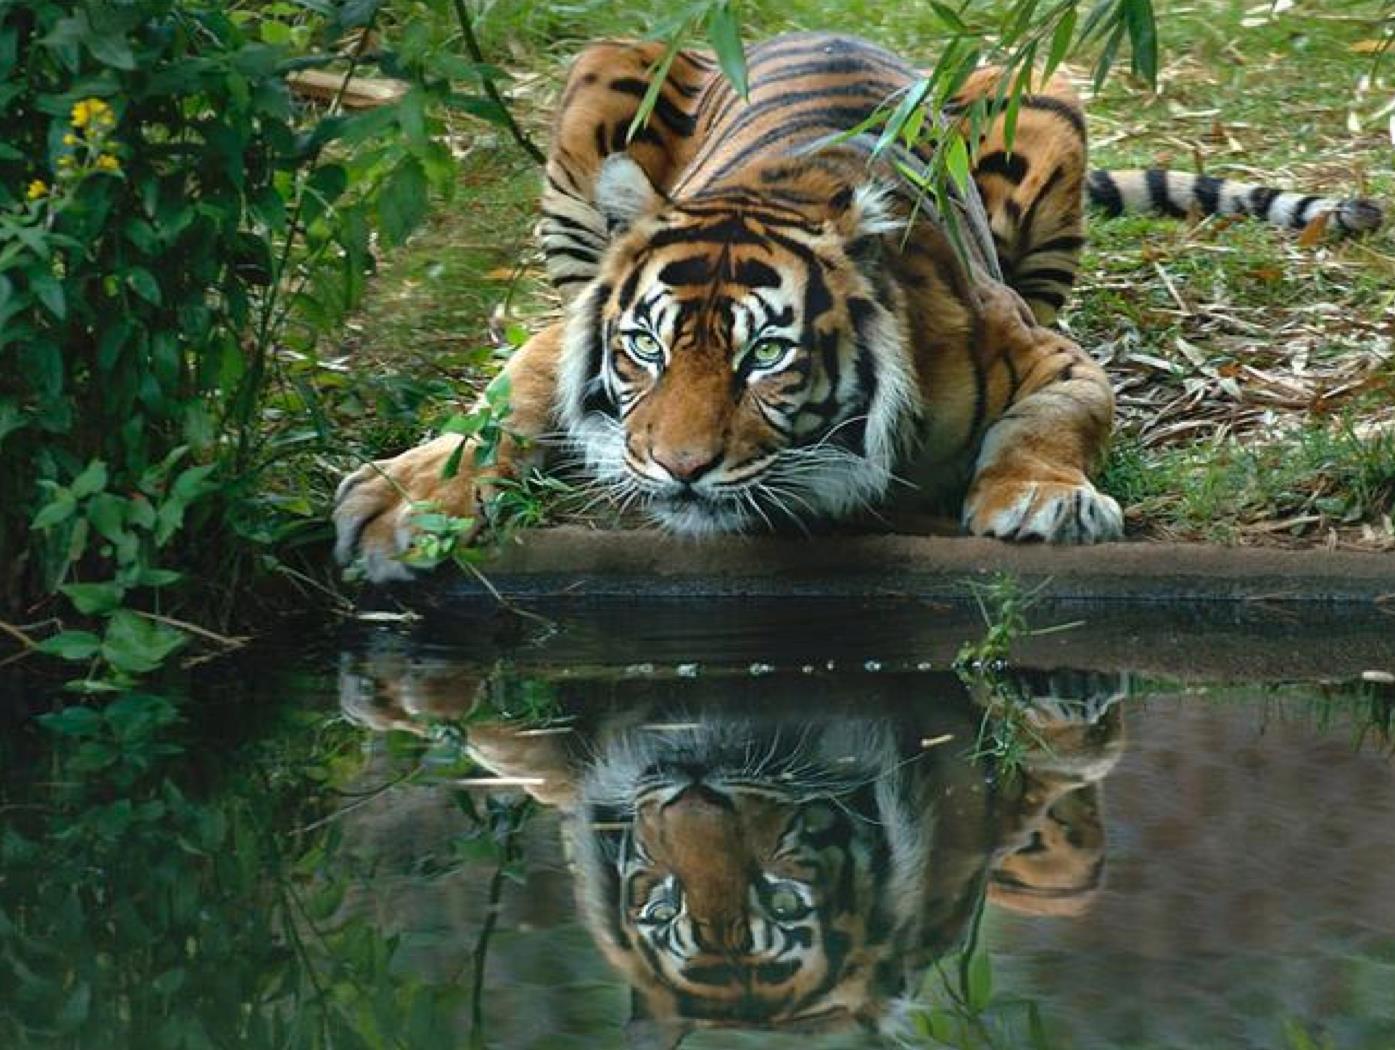 Green tiger eyes - photo#7